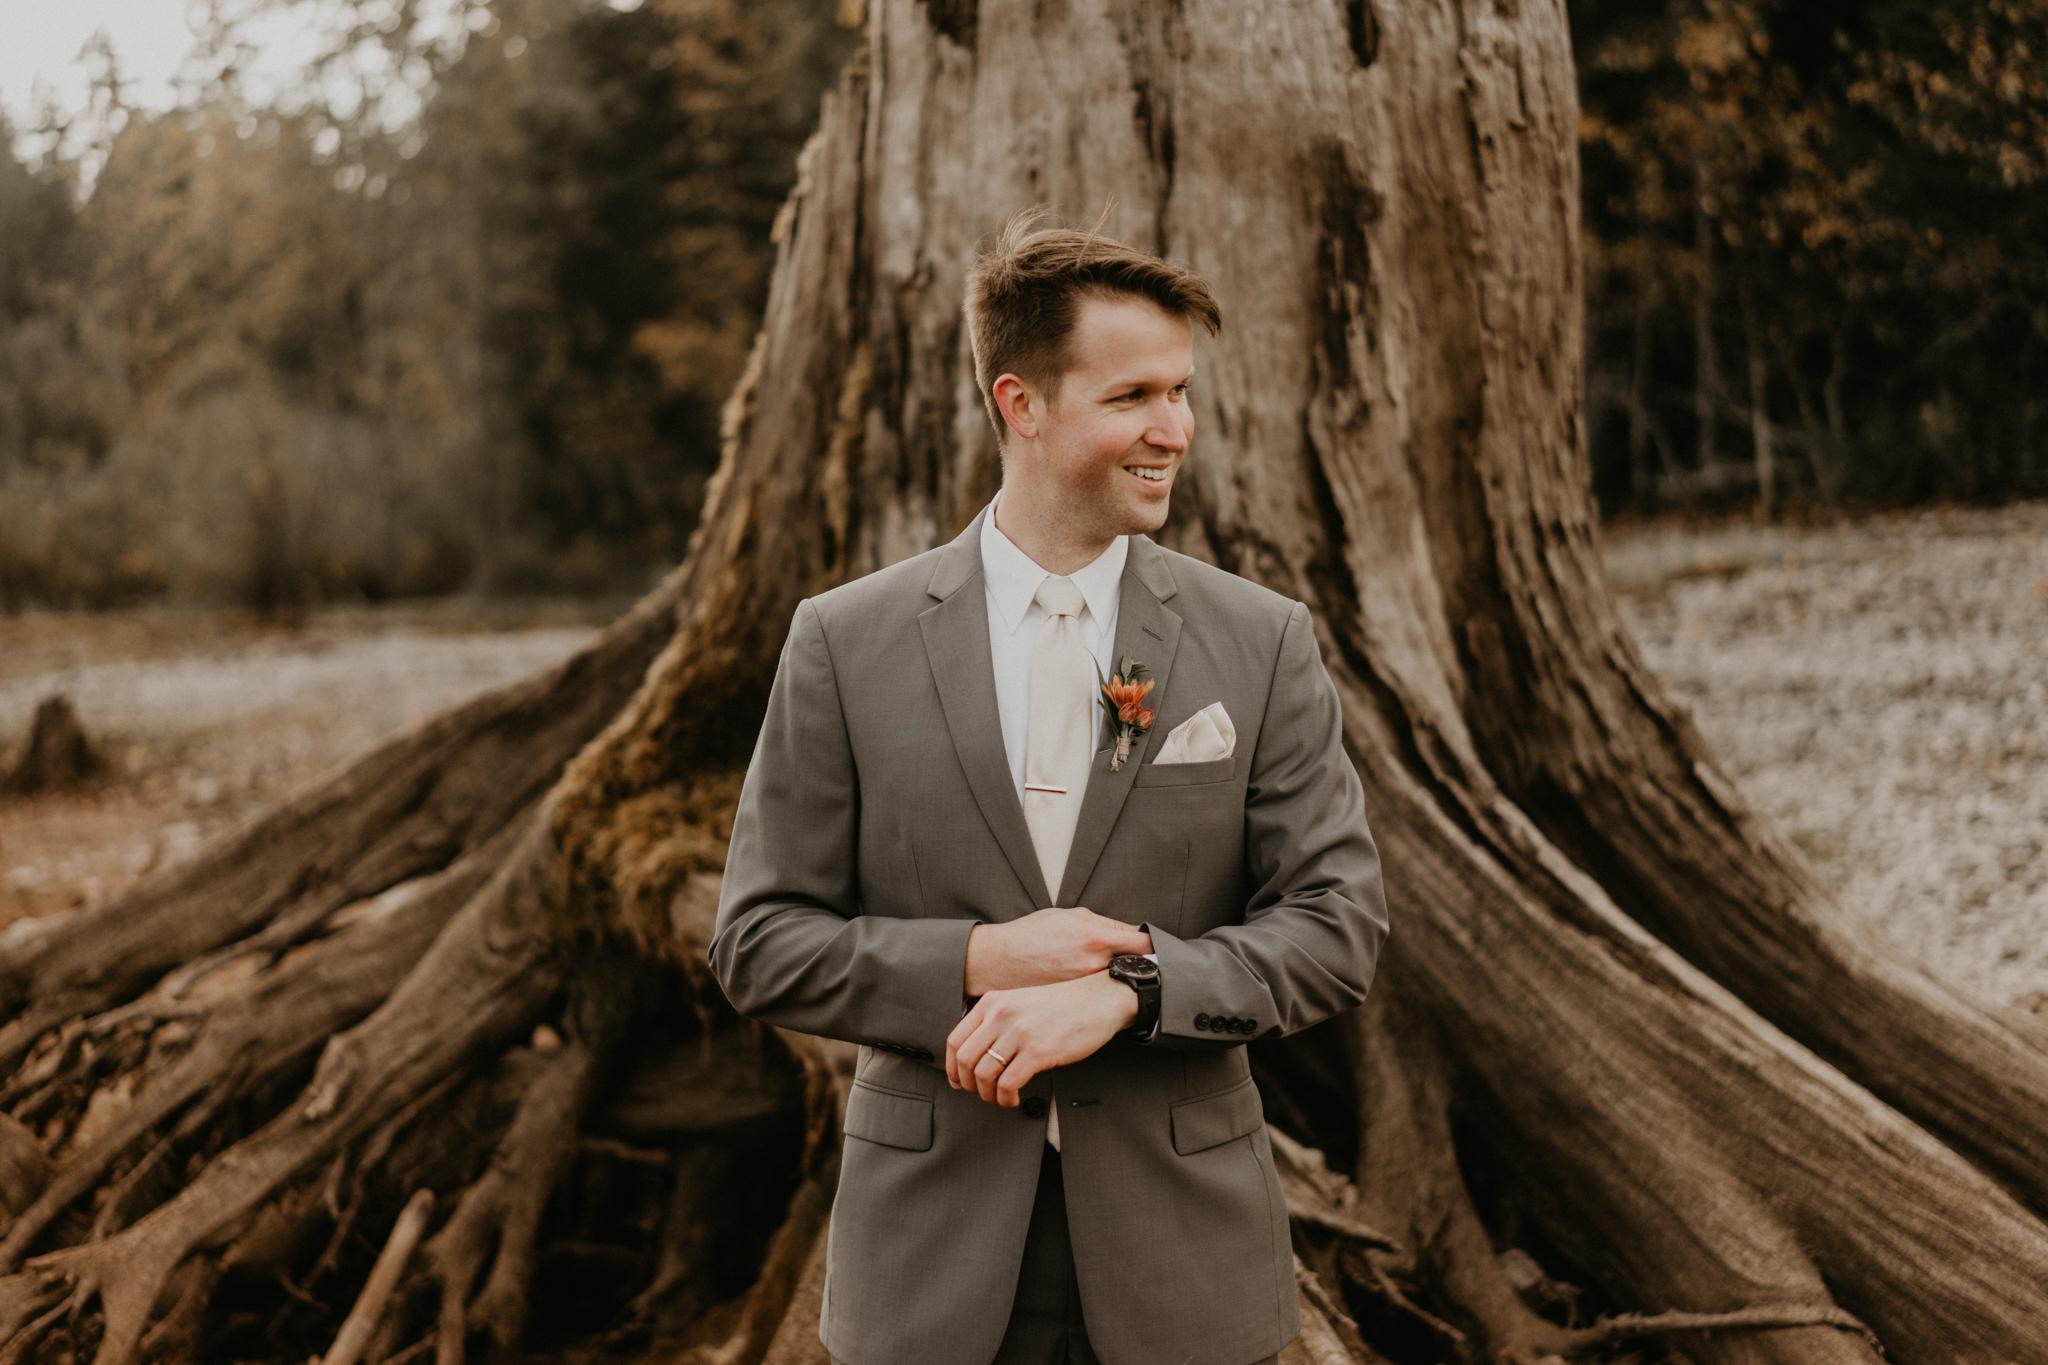 Lake-Cushman-Wedding-Elopement-Engagement-Seattle-Washington-PNW-Adventure-Nature-Photographer-20.jpg